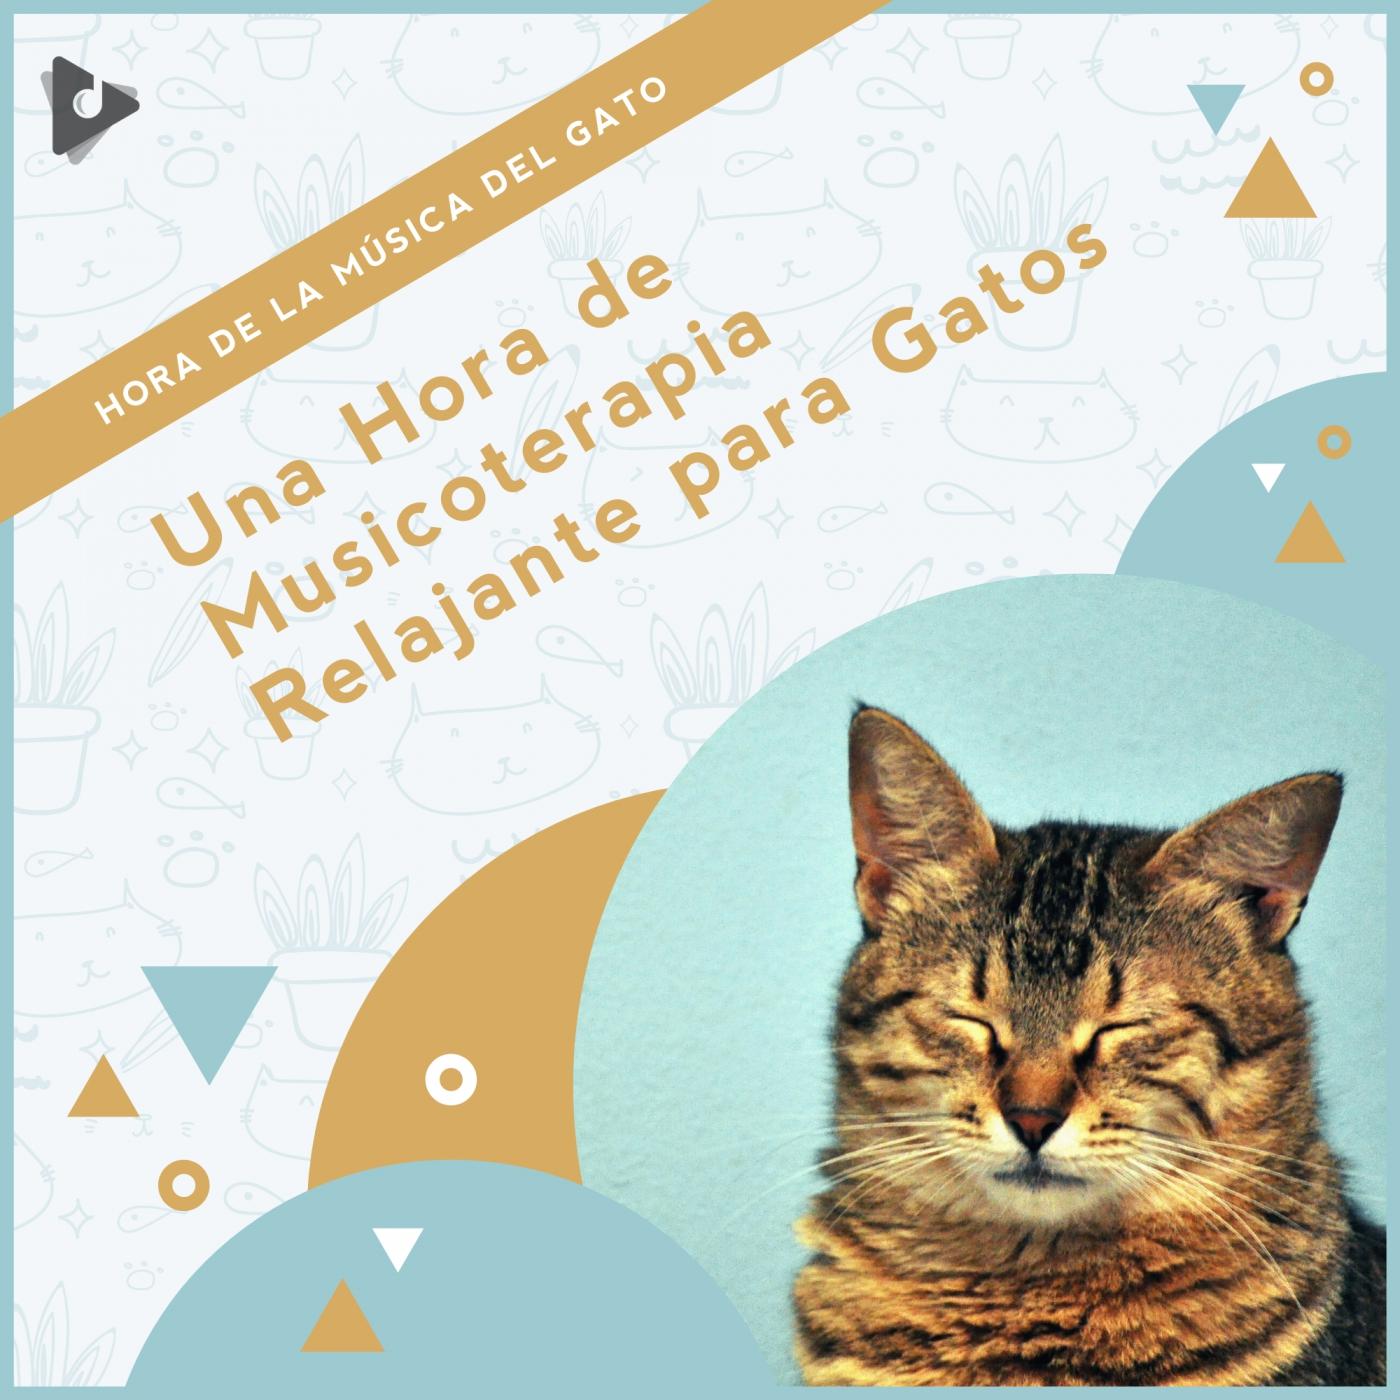 Una Hora de Musicoterapia Relajante para Gatos